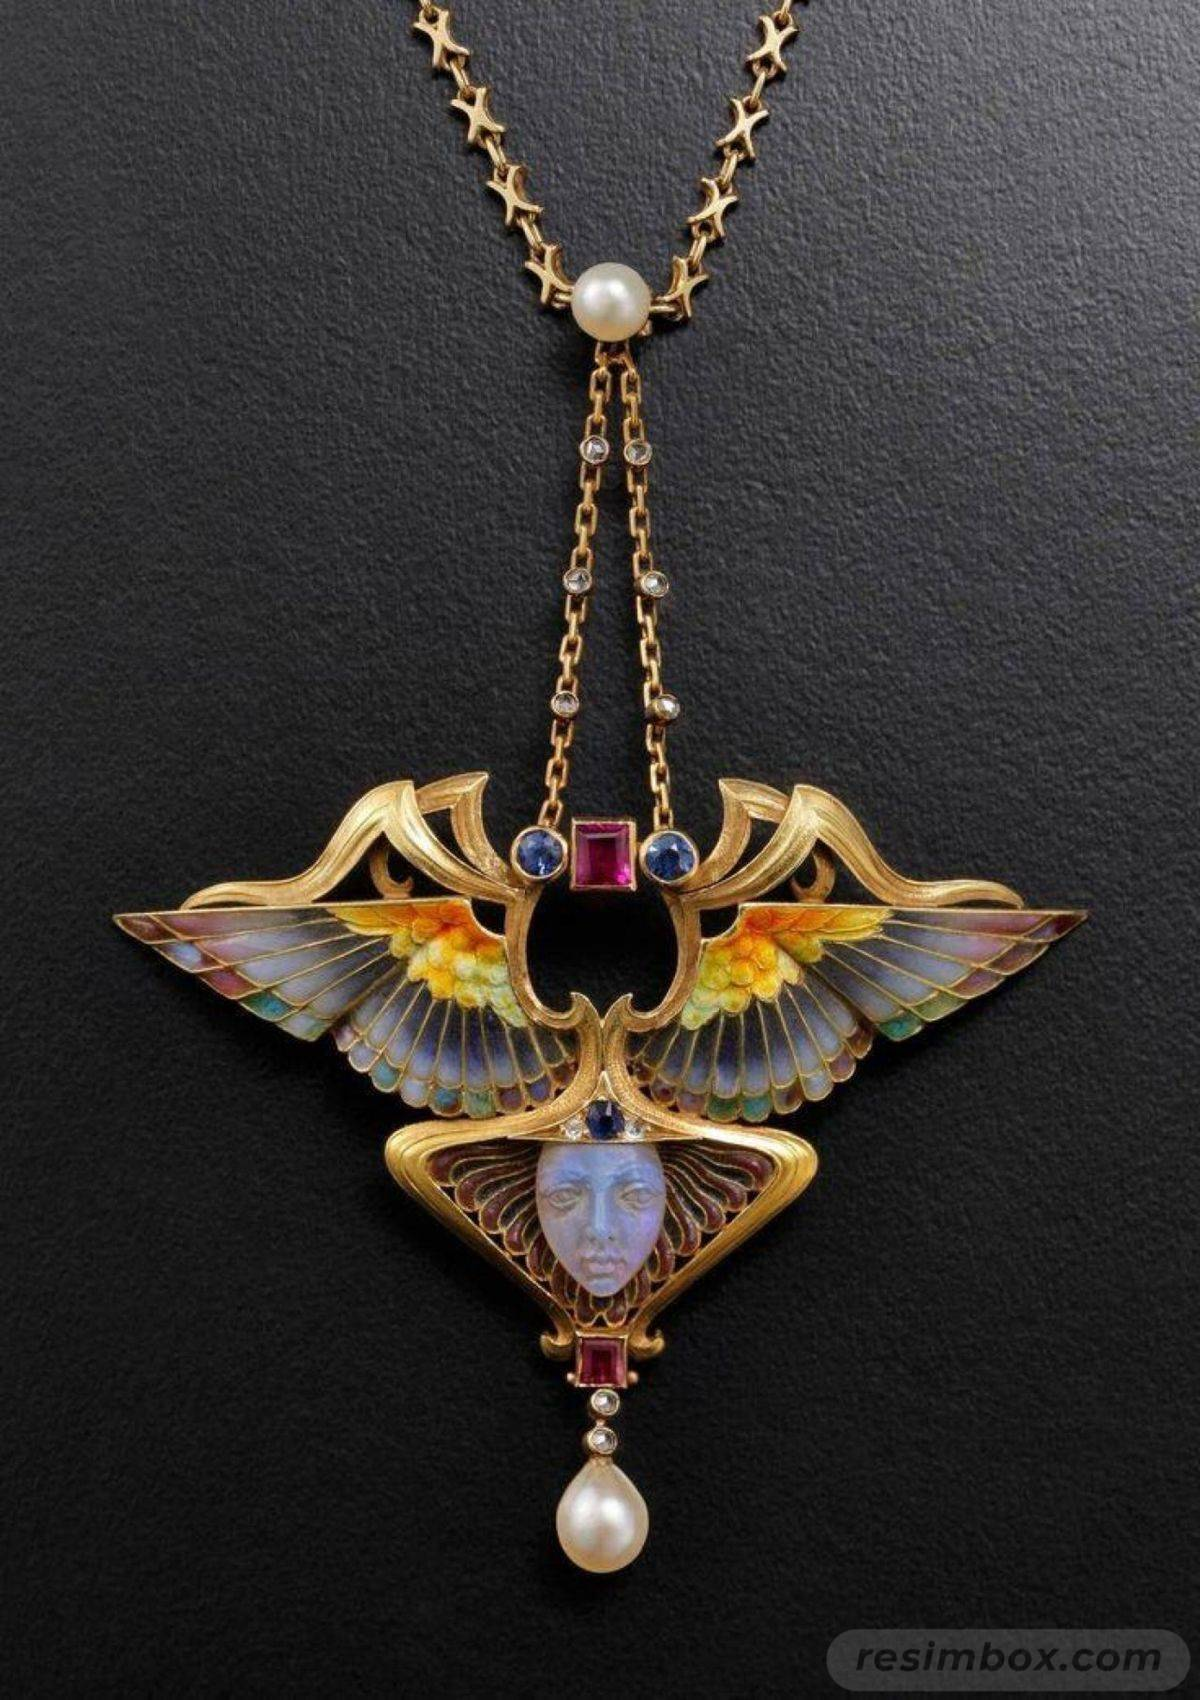 Art deco jewelry-385268943121594252